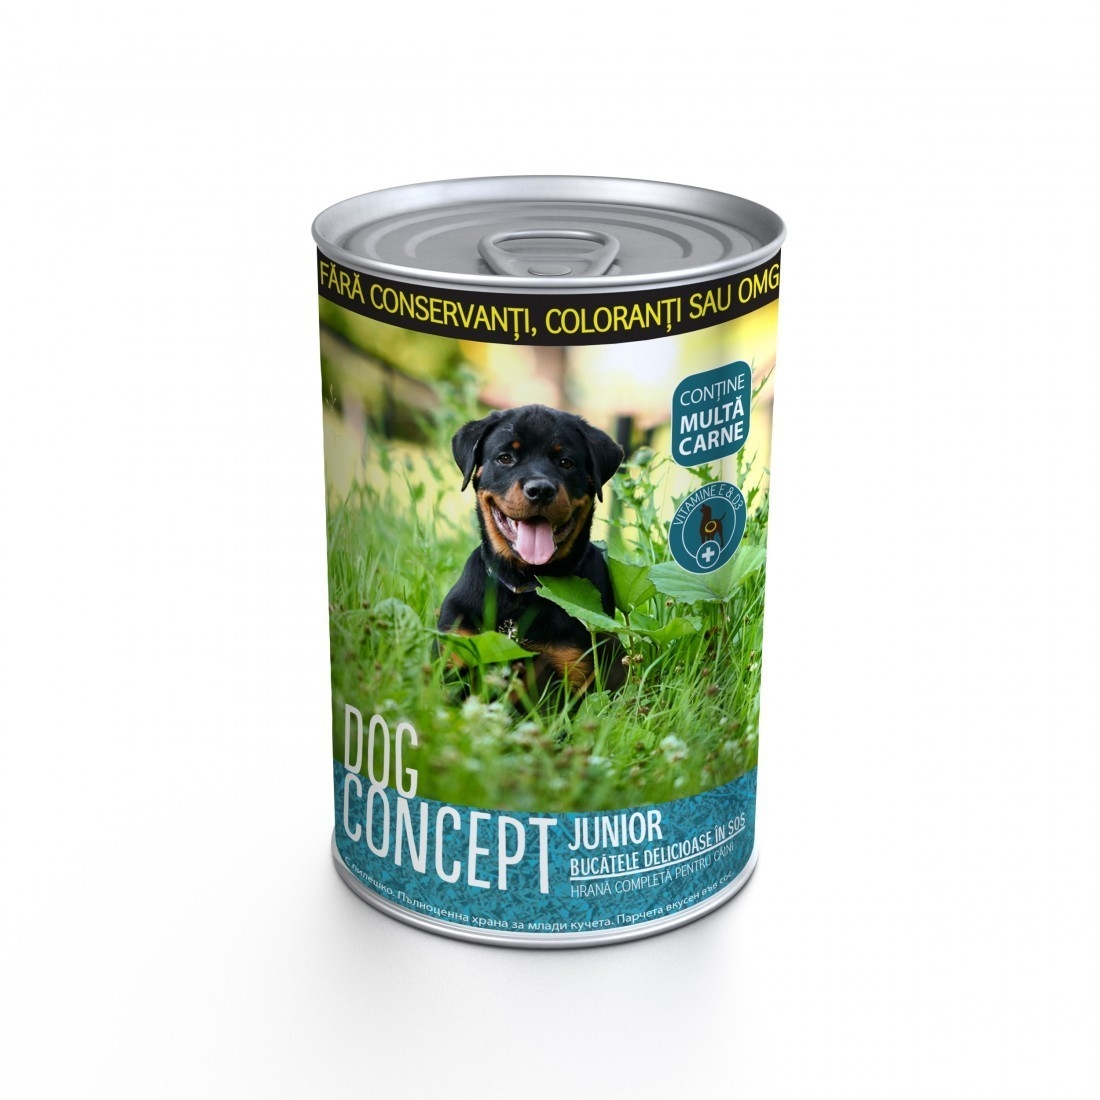 Dog Concept Conserva Junior, 415 g